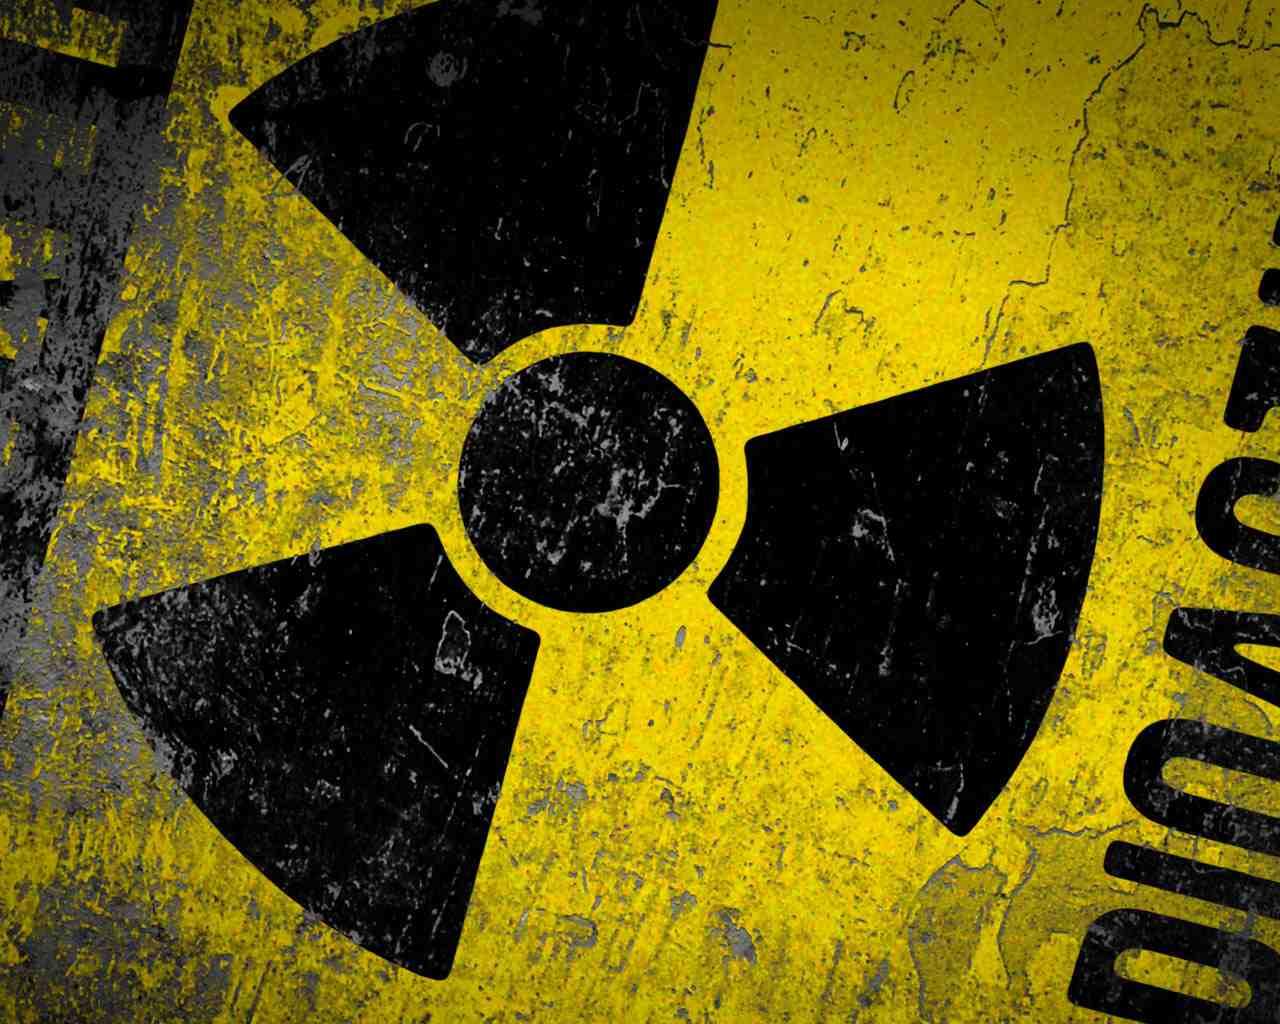 Chillstep radioactive dating